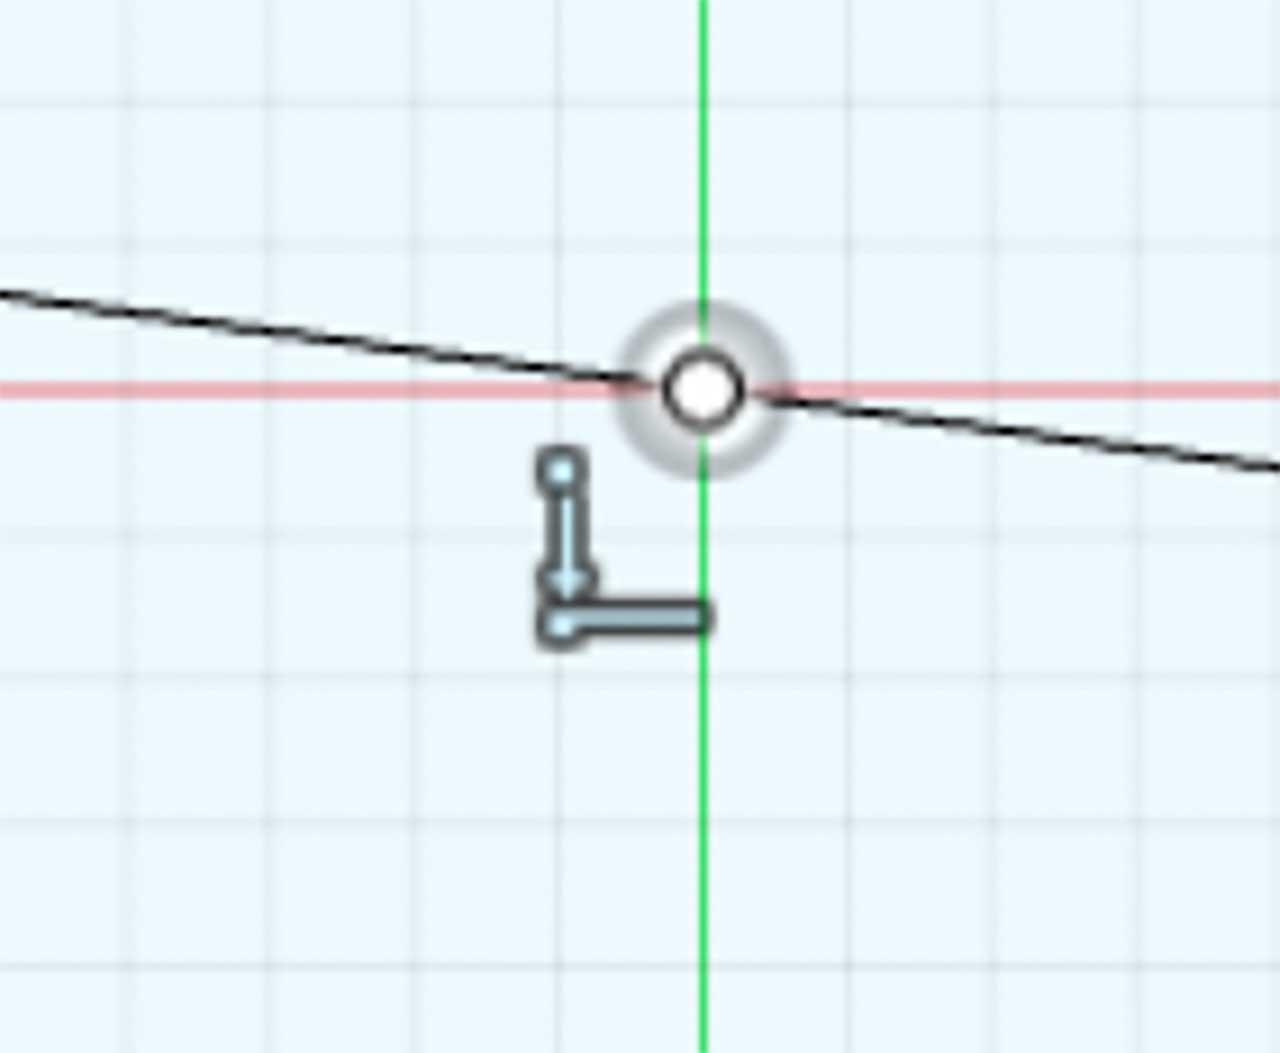 Fusion360 原点の円スケッチが移動できない拘束 一致の解除法